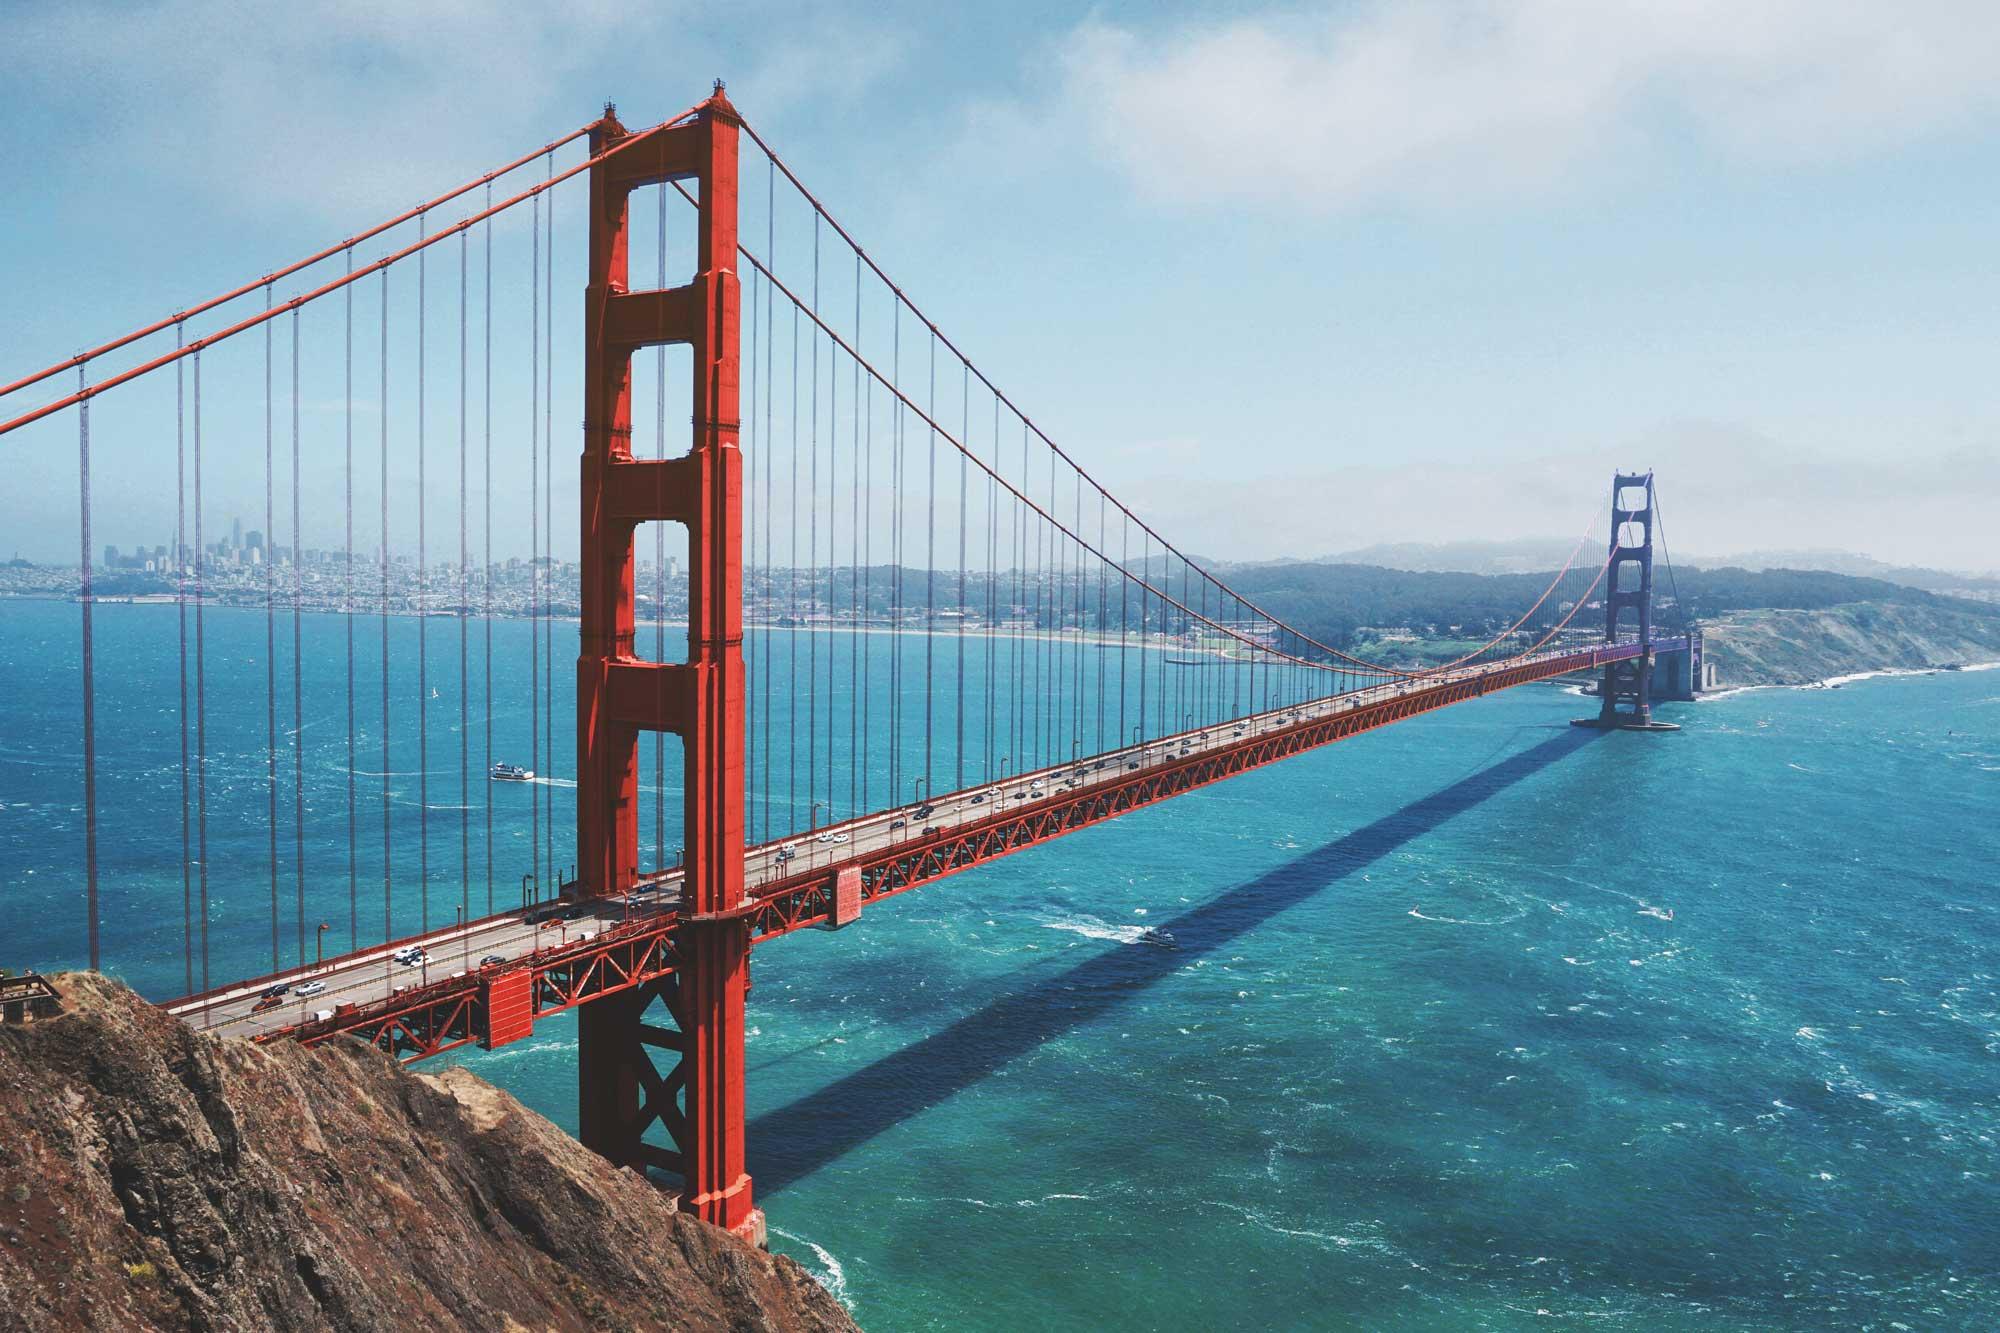 Zabrana Airbnb San Francisco